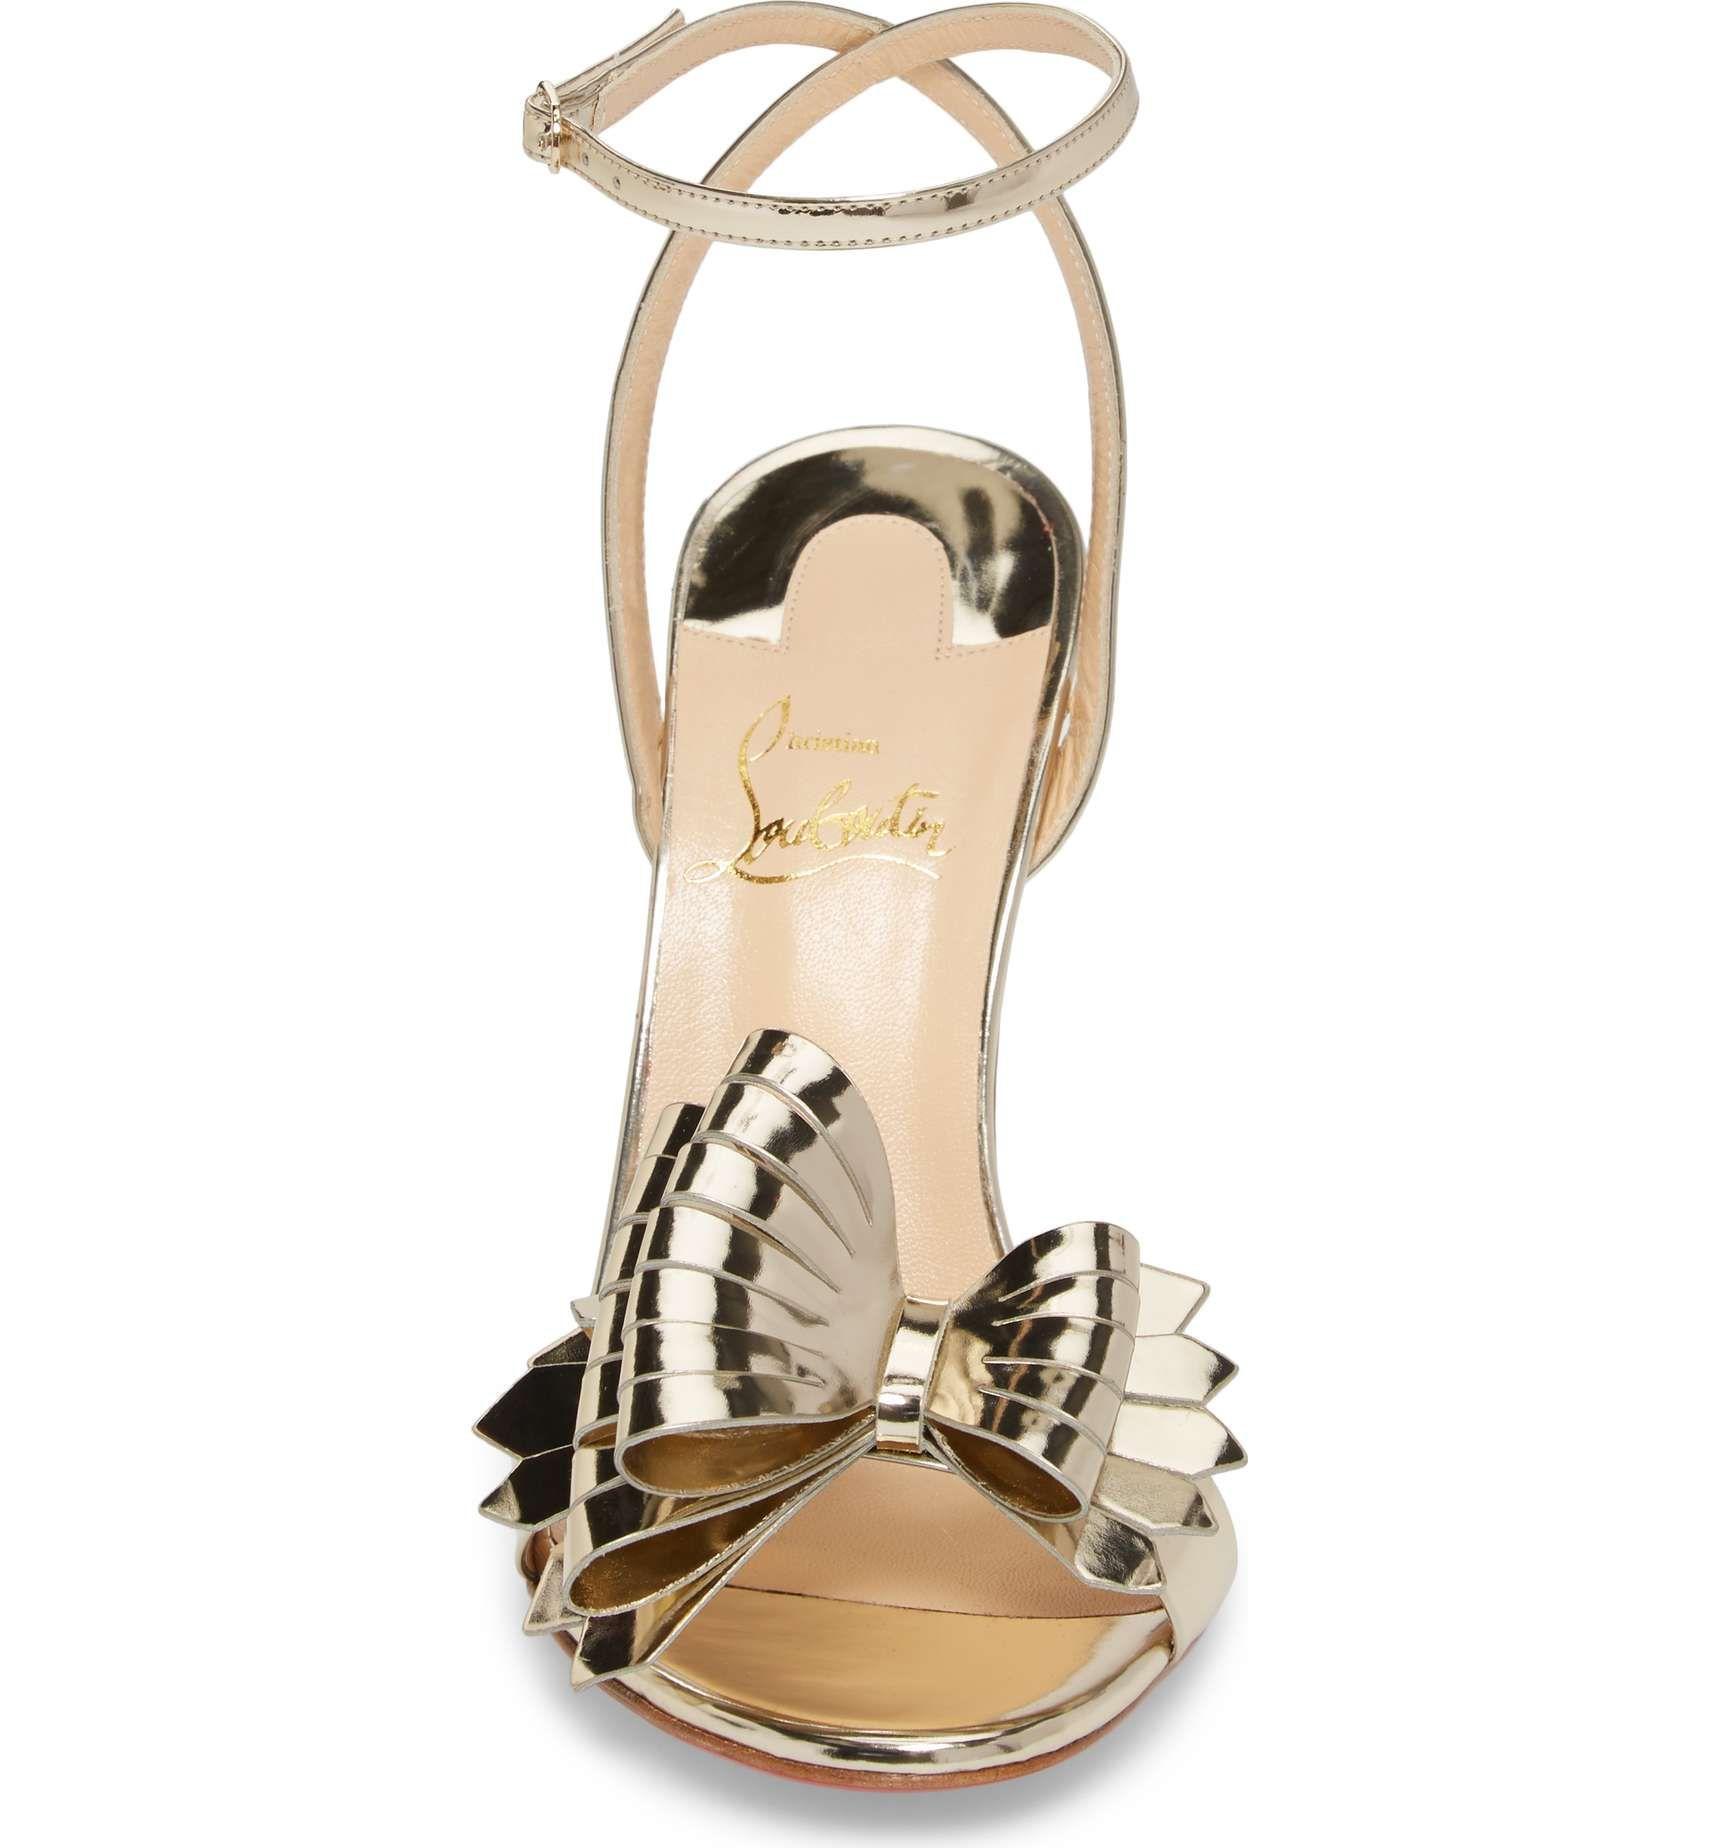 on sale 438f1 4185a Main Image - Christian Louboutin Miss Valois Bow Sandal ...